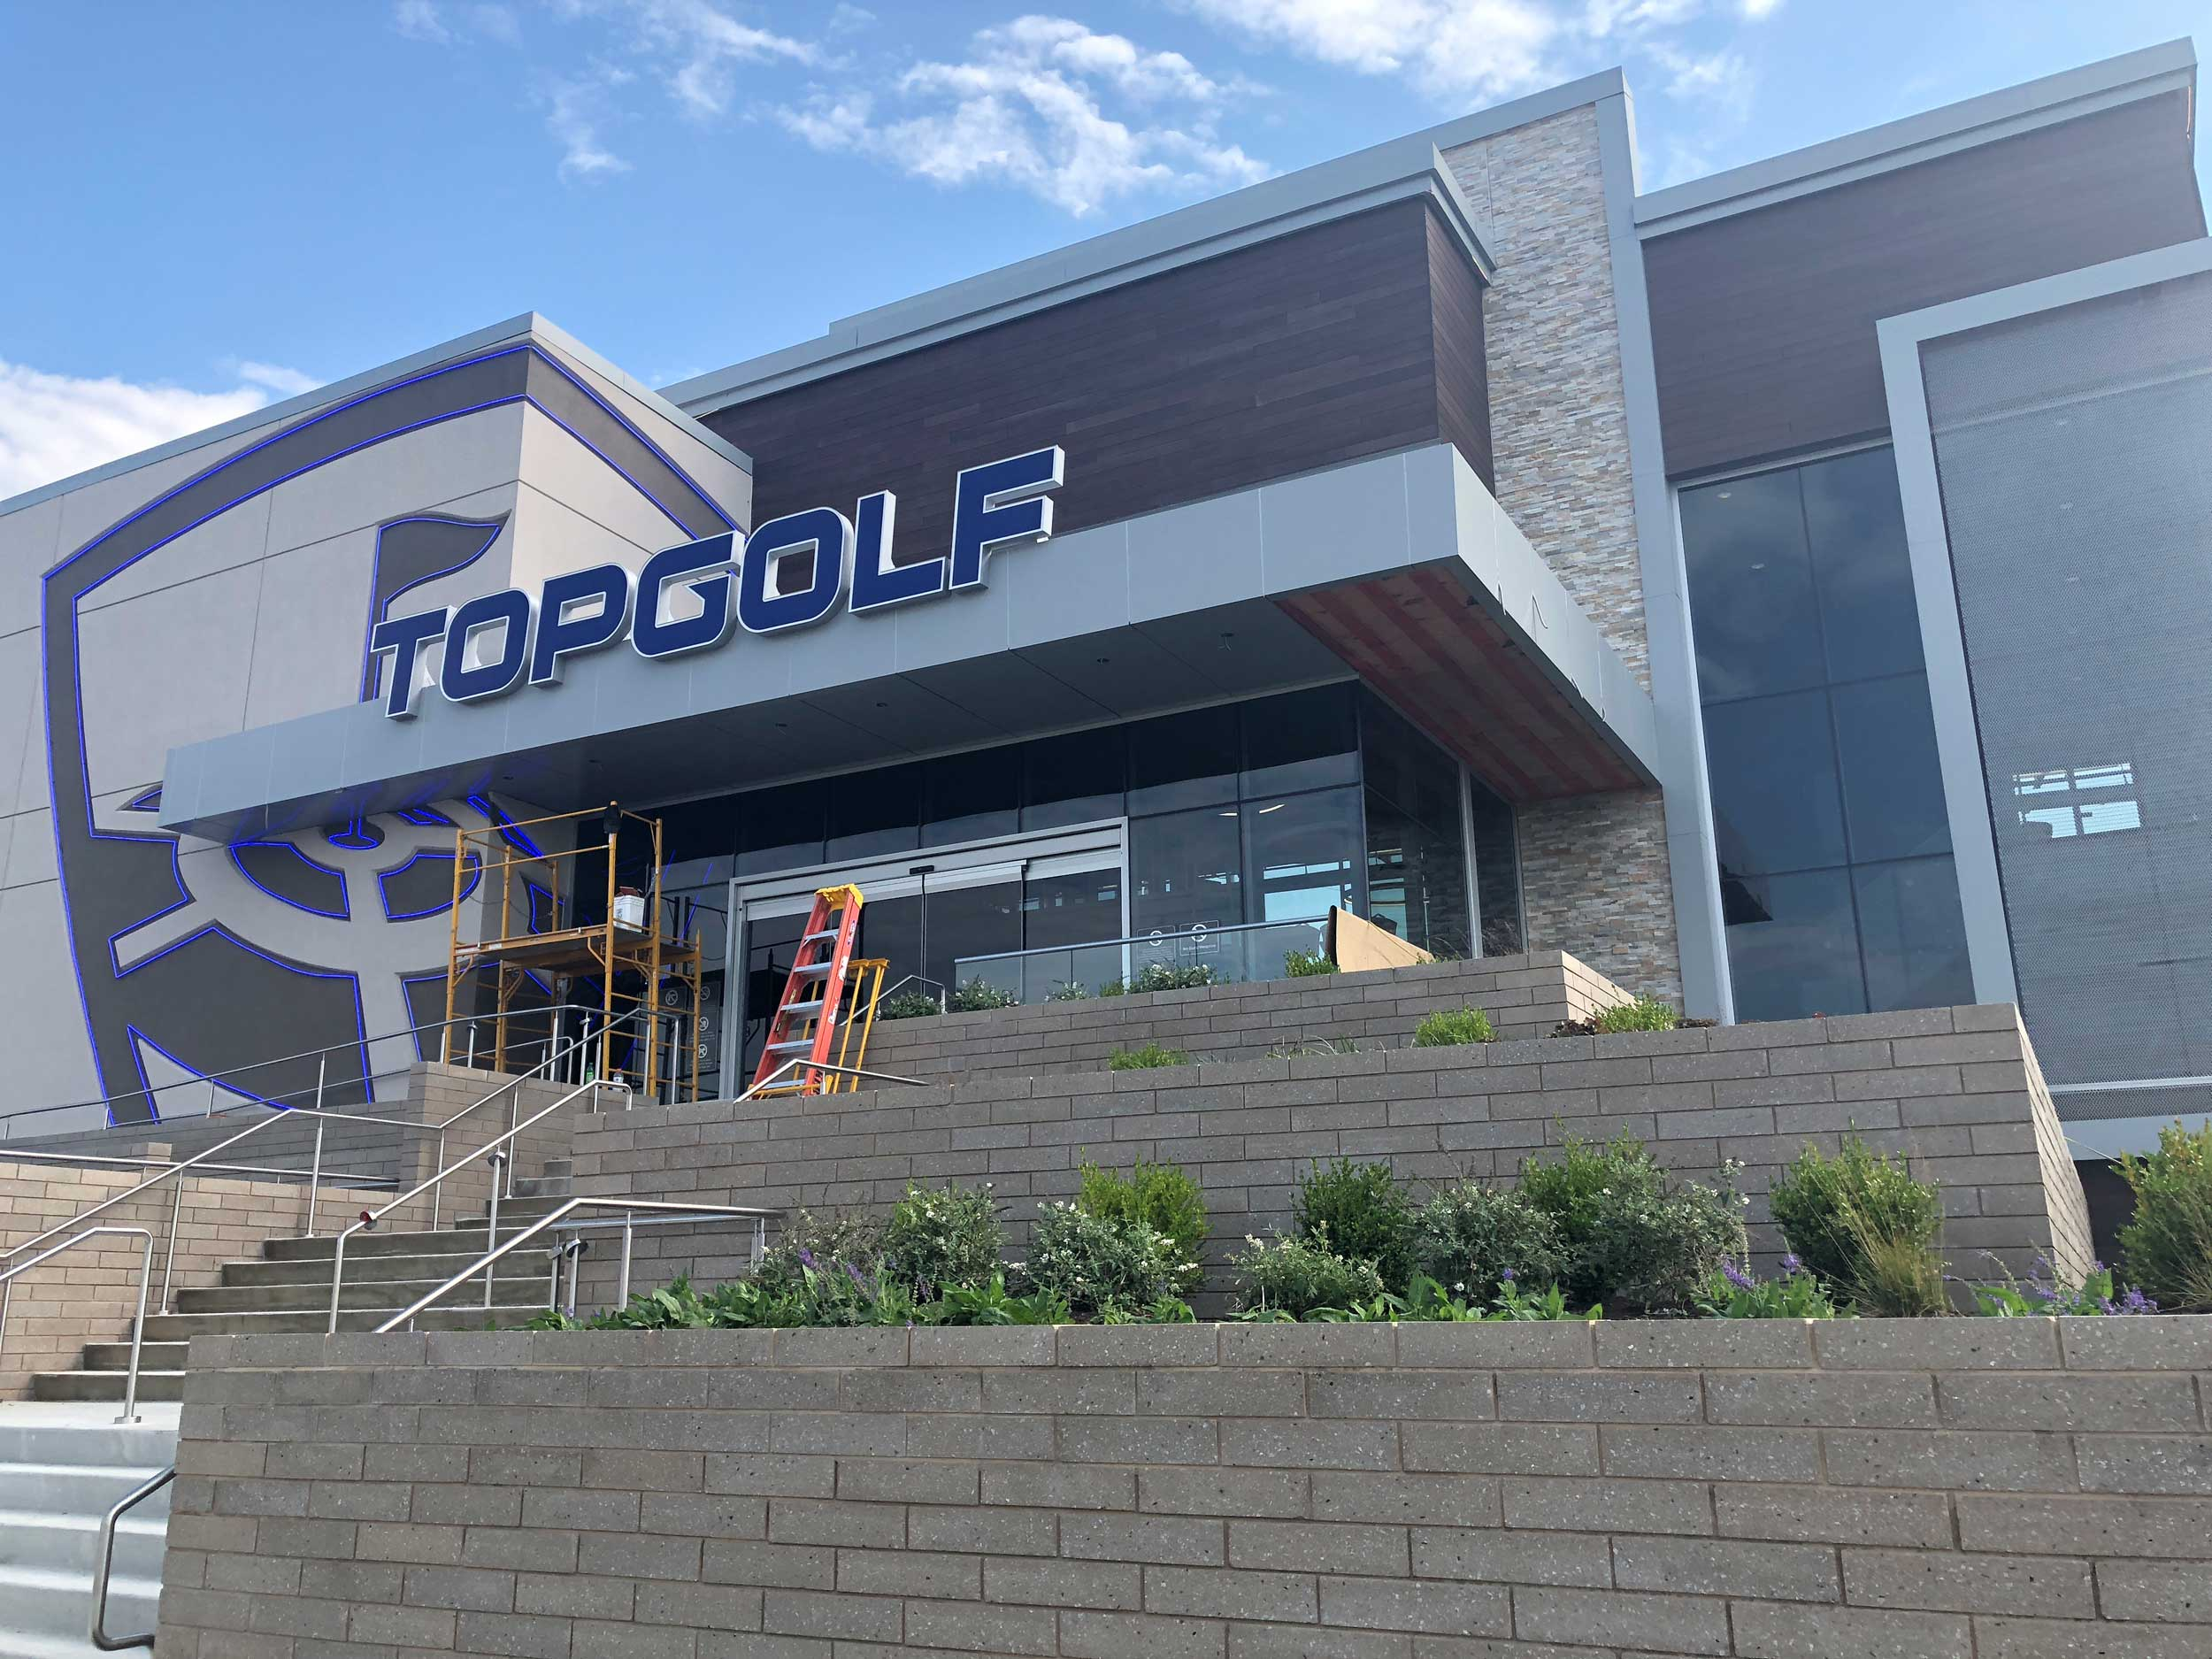 TOPGOLF POLARIS